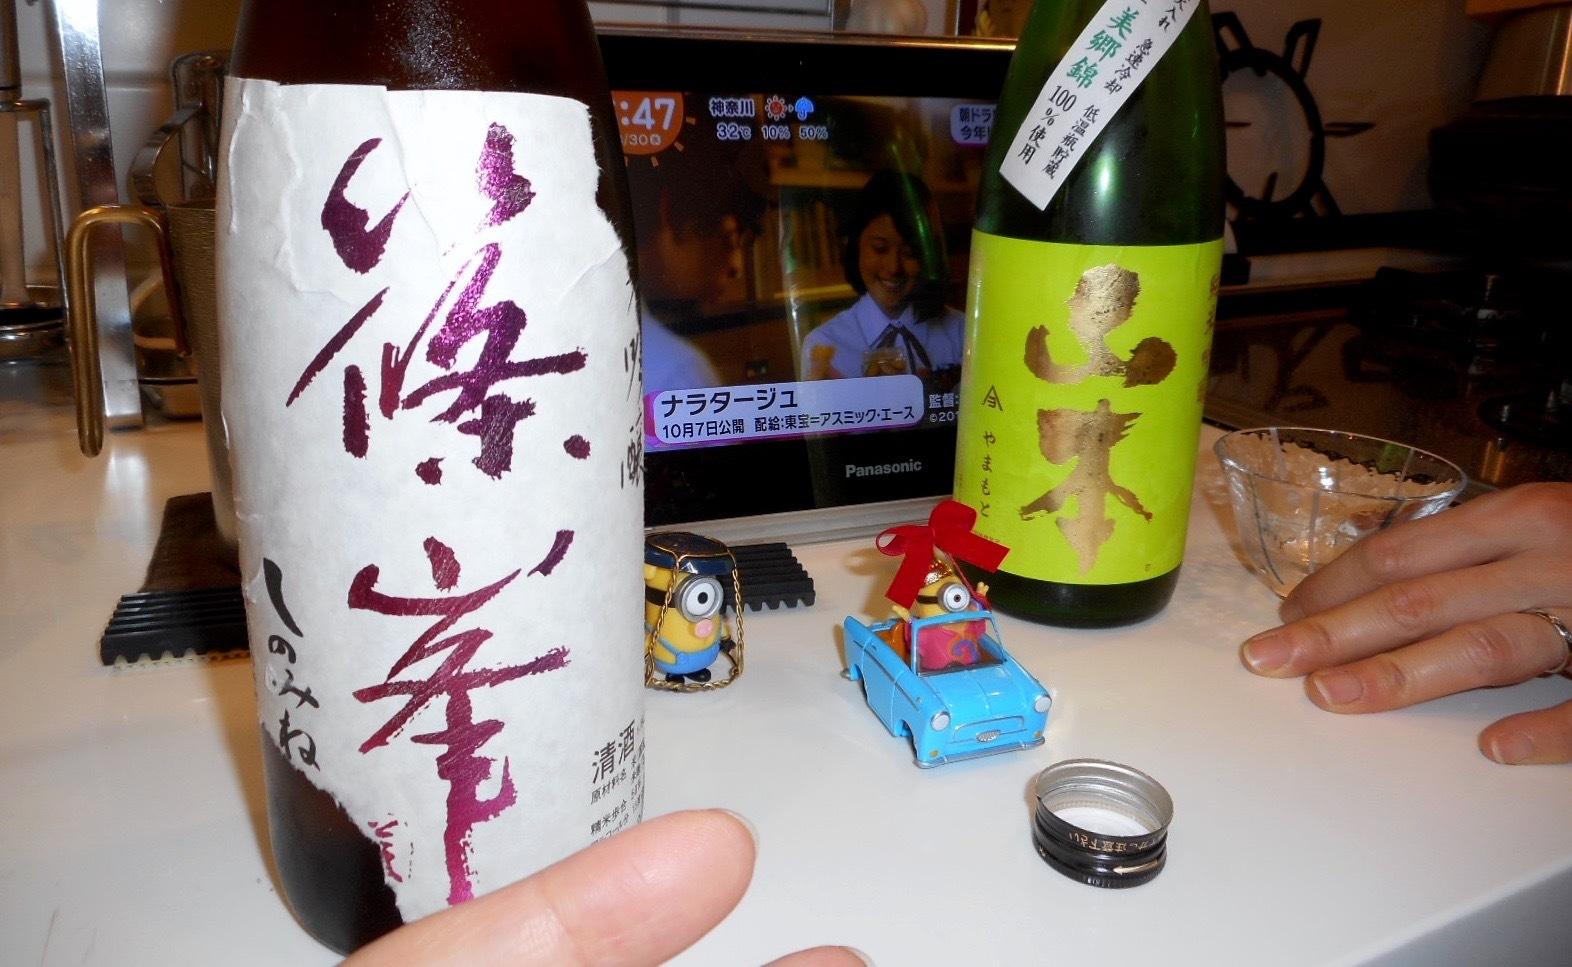 yamamoto_misatonishiki55_28by10.jpg